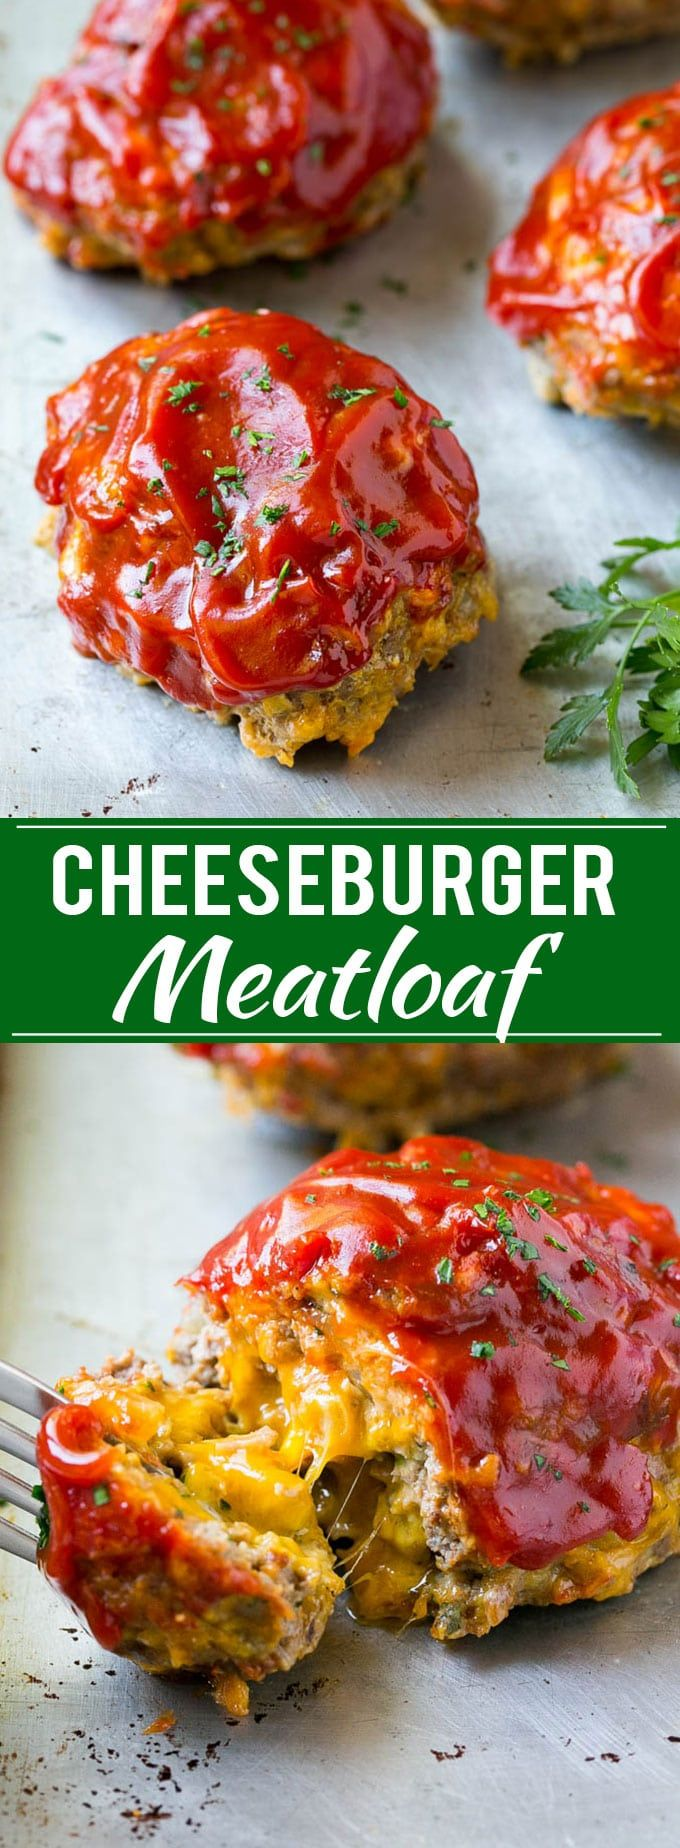 Cheeseburger Meatloaf Recipe | Individual Meatloaf | Mini Meatloaf | Bacon Cheeseburger Meatloaf Recipe